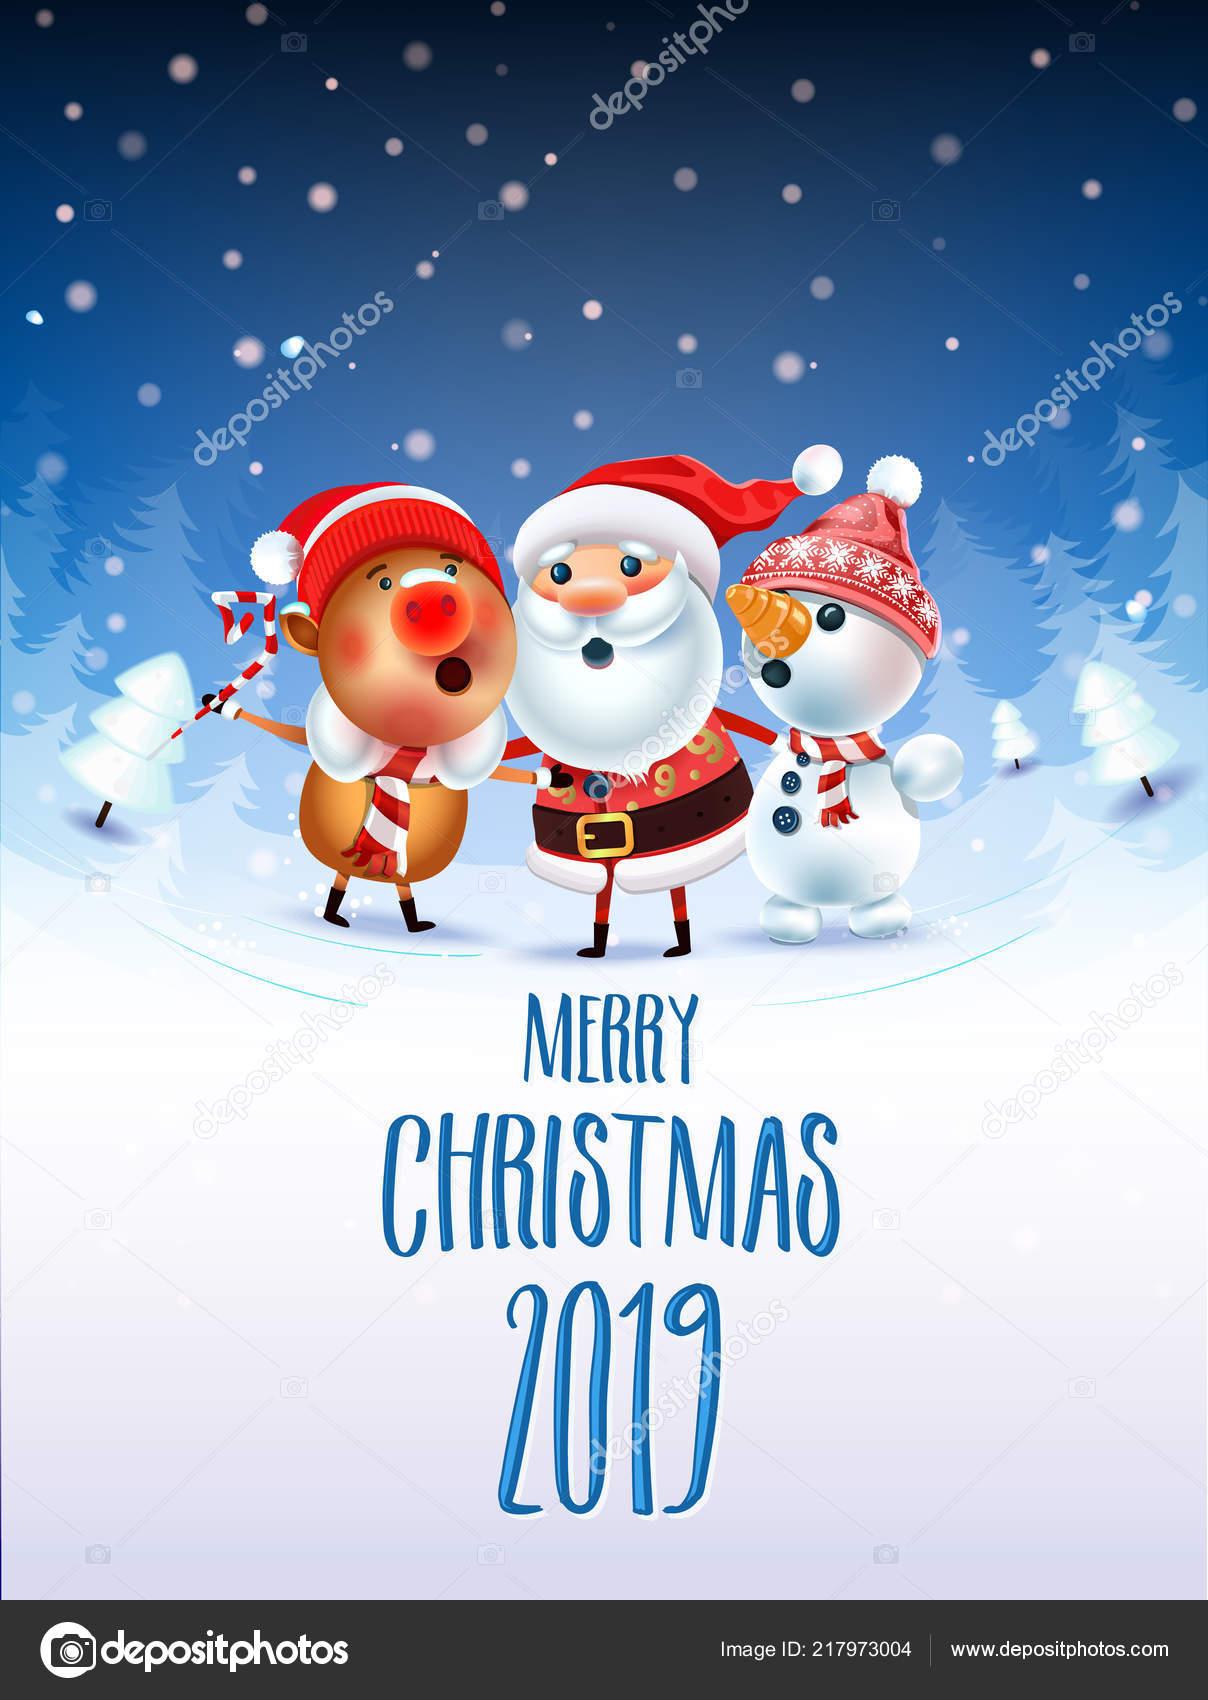 Chanson Joyeux Noel.Affiche Joyeux Noel Nouvel 2019 Pere Noel Bonhomme Neige